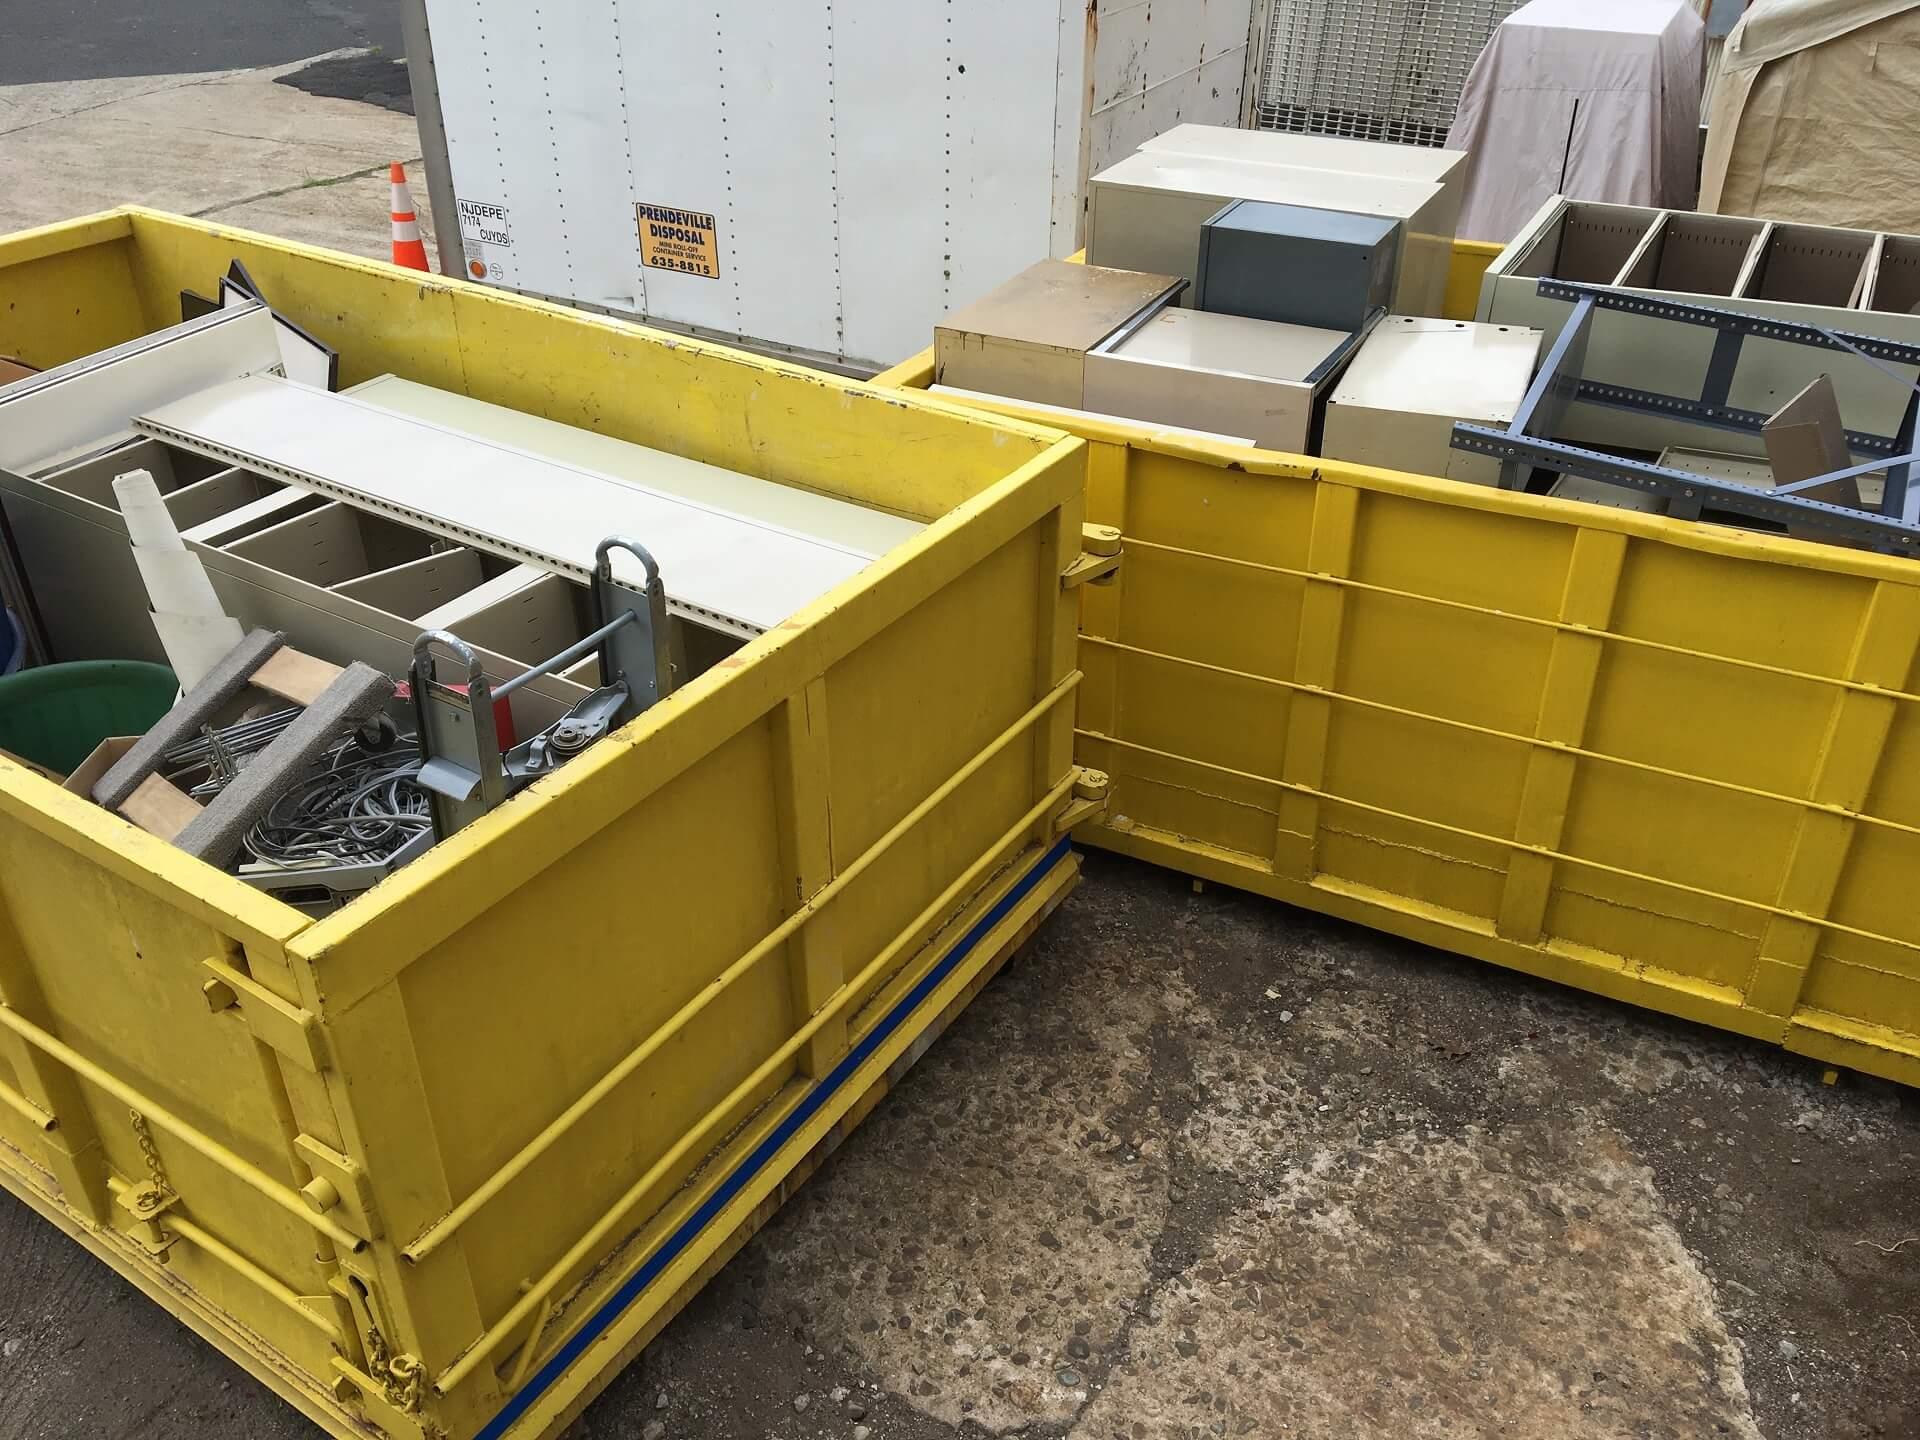 Office Clean Out Dumpster Services-Colorado's Premier Dumpster Rental Services